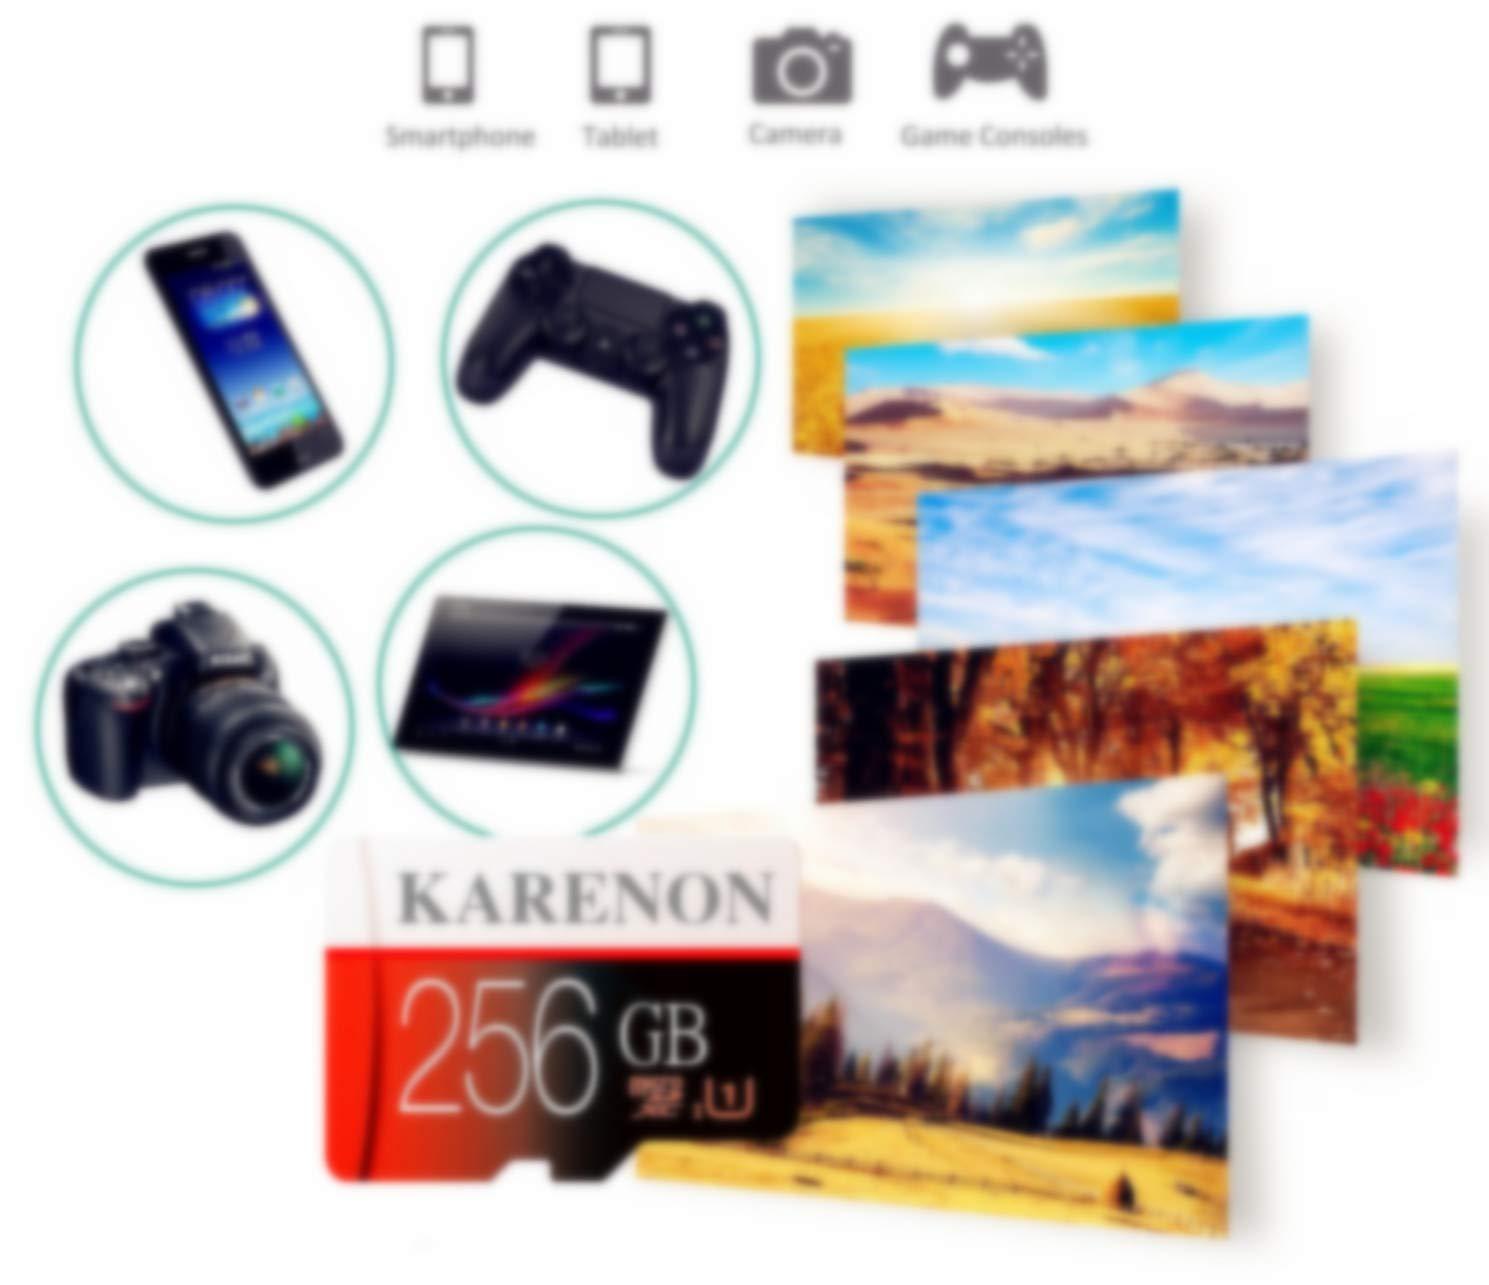 Karenon Tarjeta Micro SD 256 GB, microSDXC 256 GB Class 10 Tarjeta de Memoria + Adaptador (DS135-SQ) (256gb)